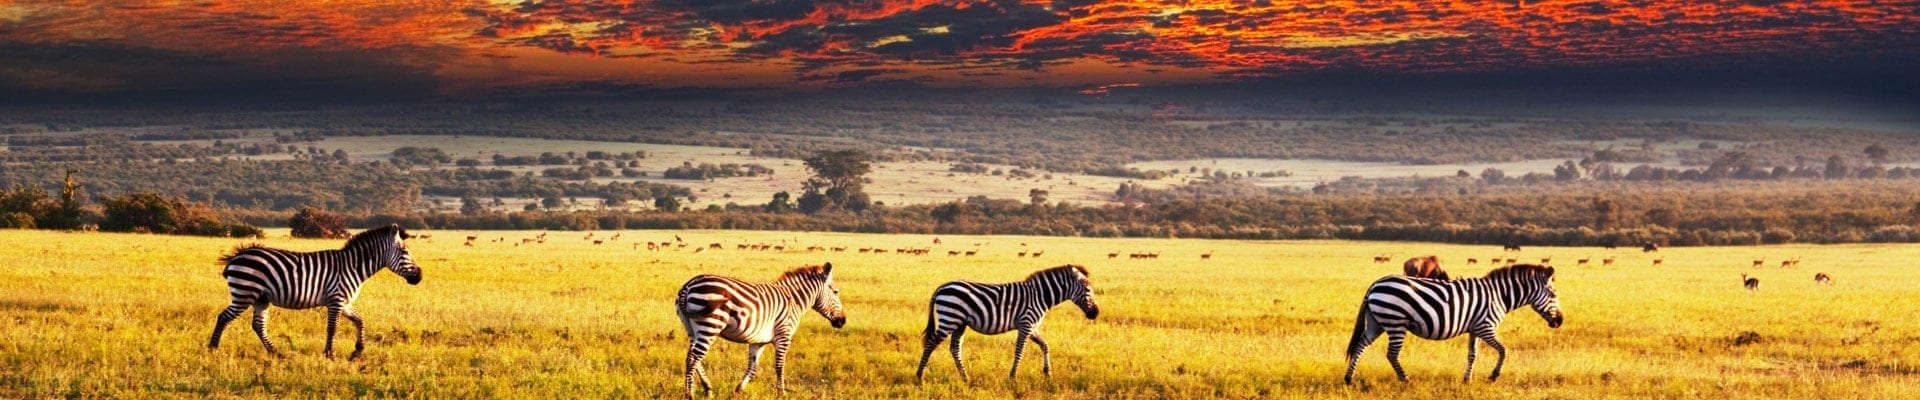 sunset-africa